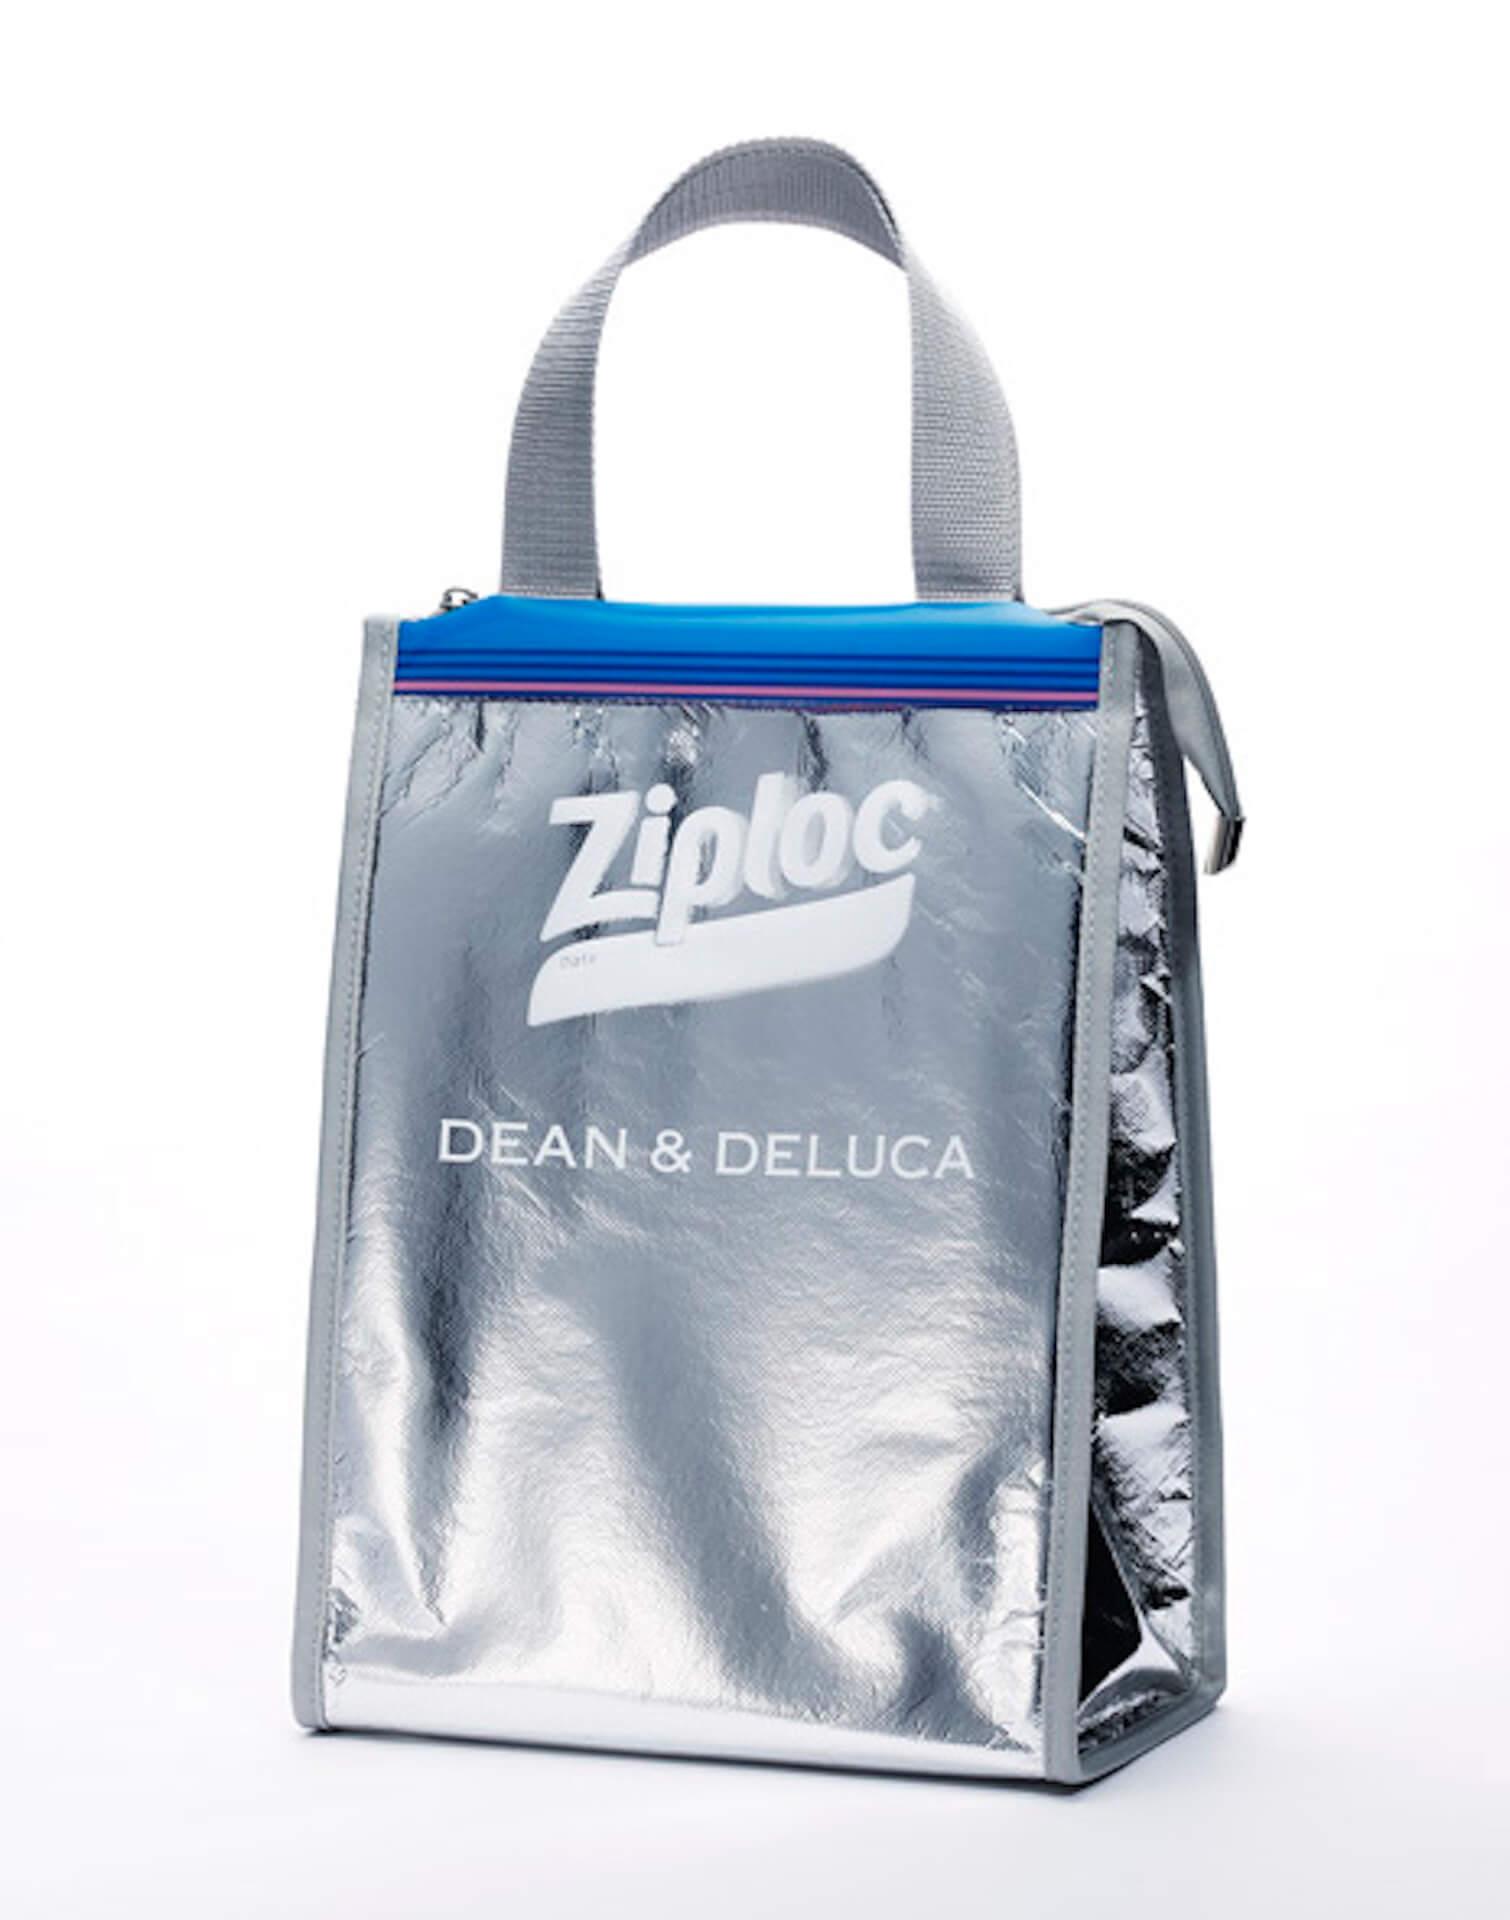 DEAN & DELUCAとBEAMS COUTURE、Ziplocのコラボクーラーバッグが再度登場!3サイズ展開で発売決定 life210419_deananddeluca_beams_ziploc_3